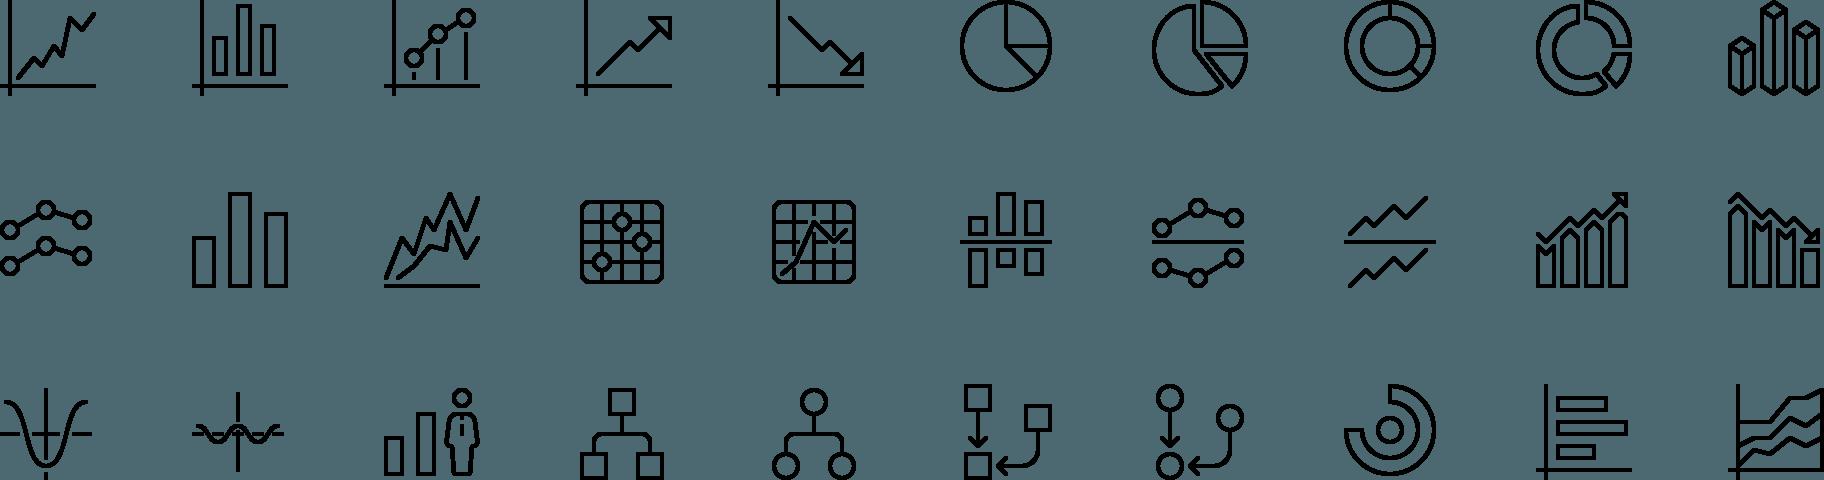 icon Charts